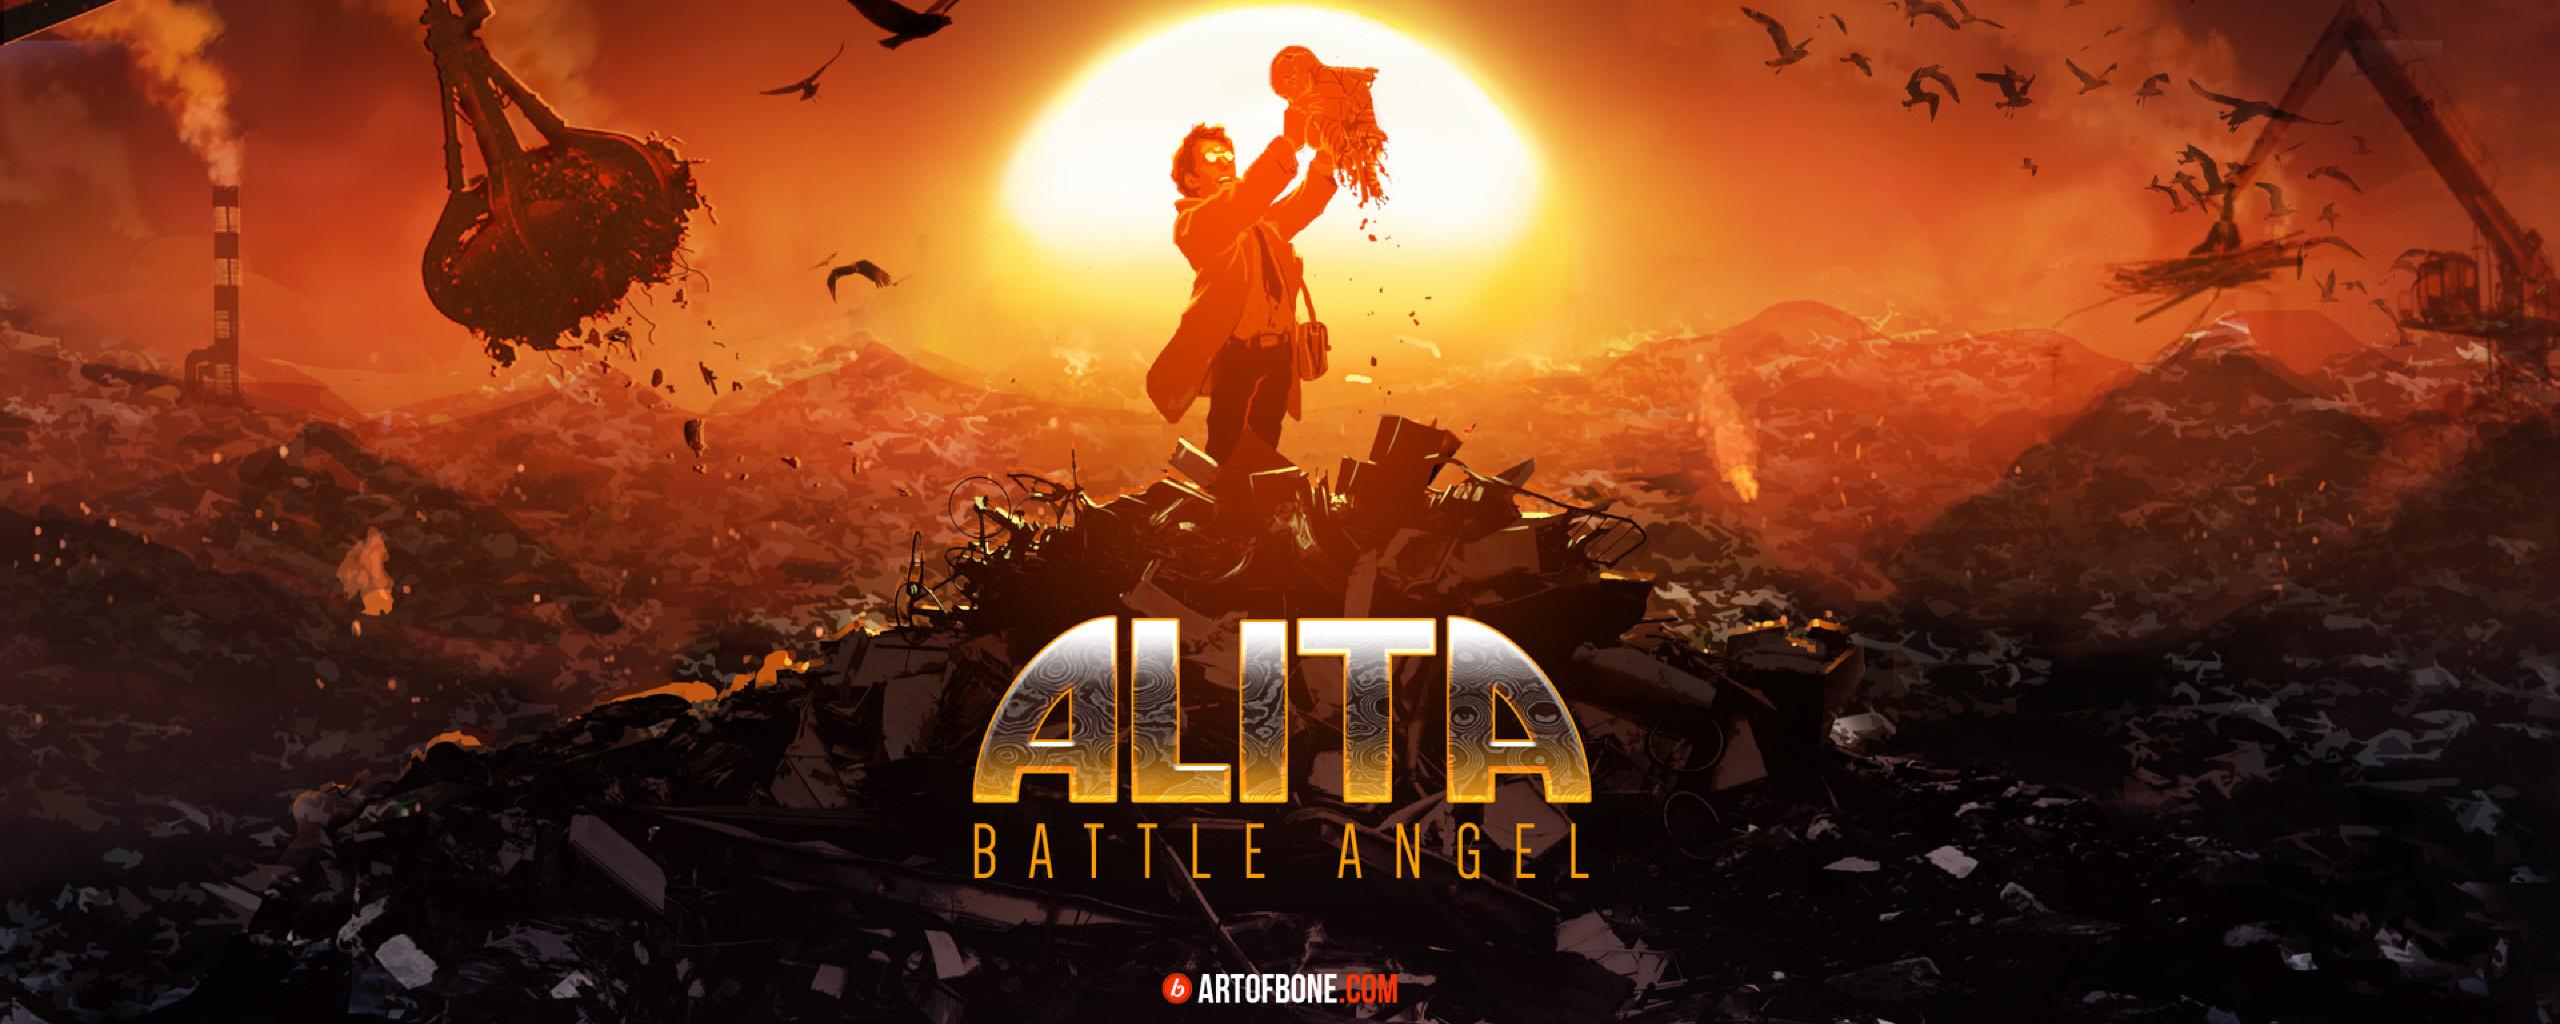 alita-battle-angel-poster-fanart_2560x1024.jpg (527.18 Kb)